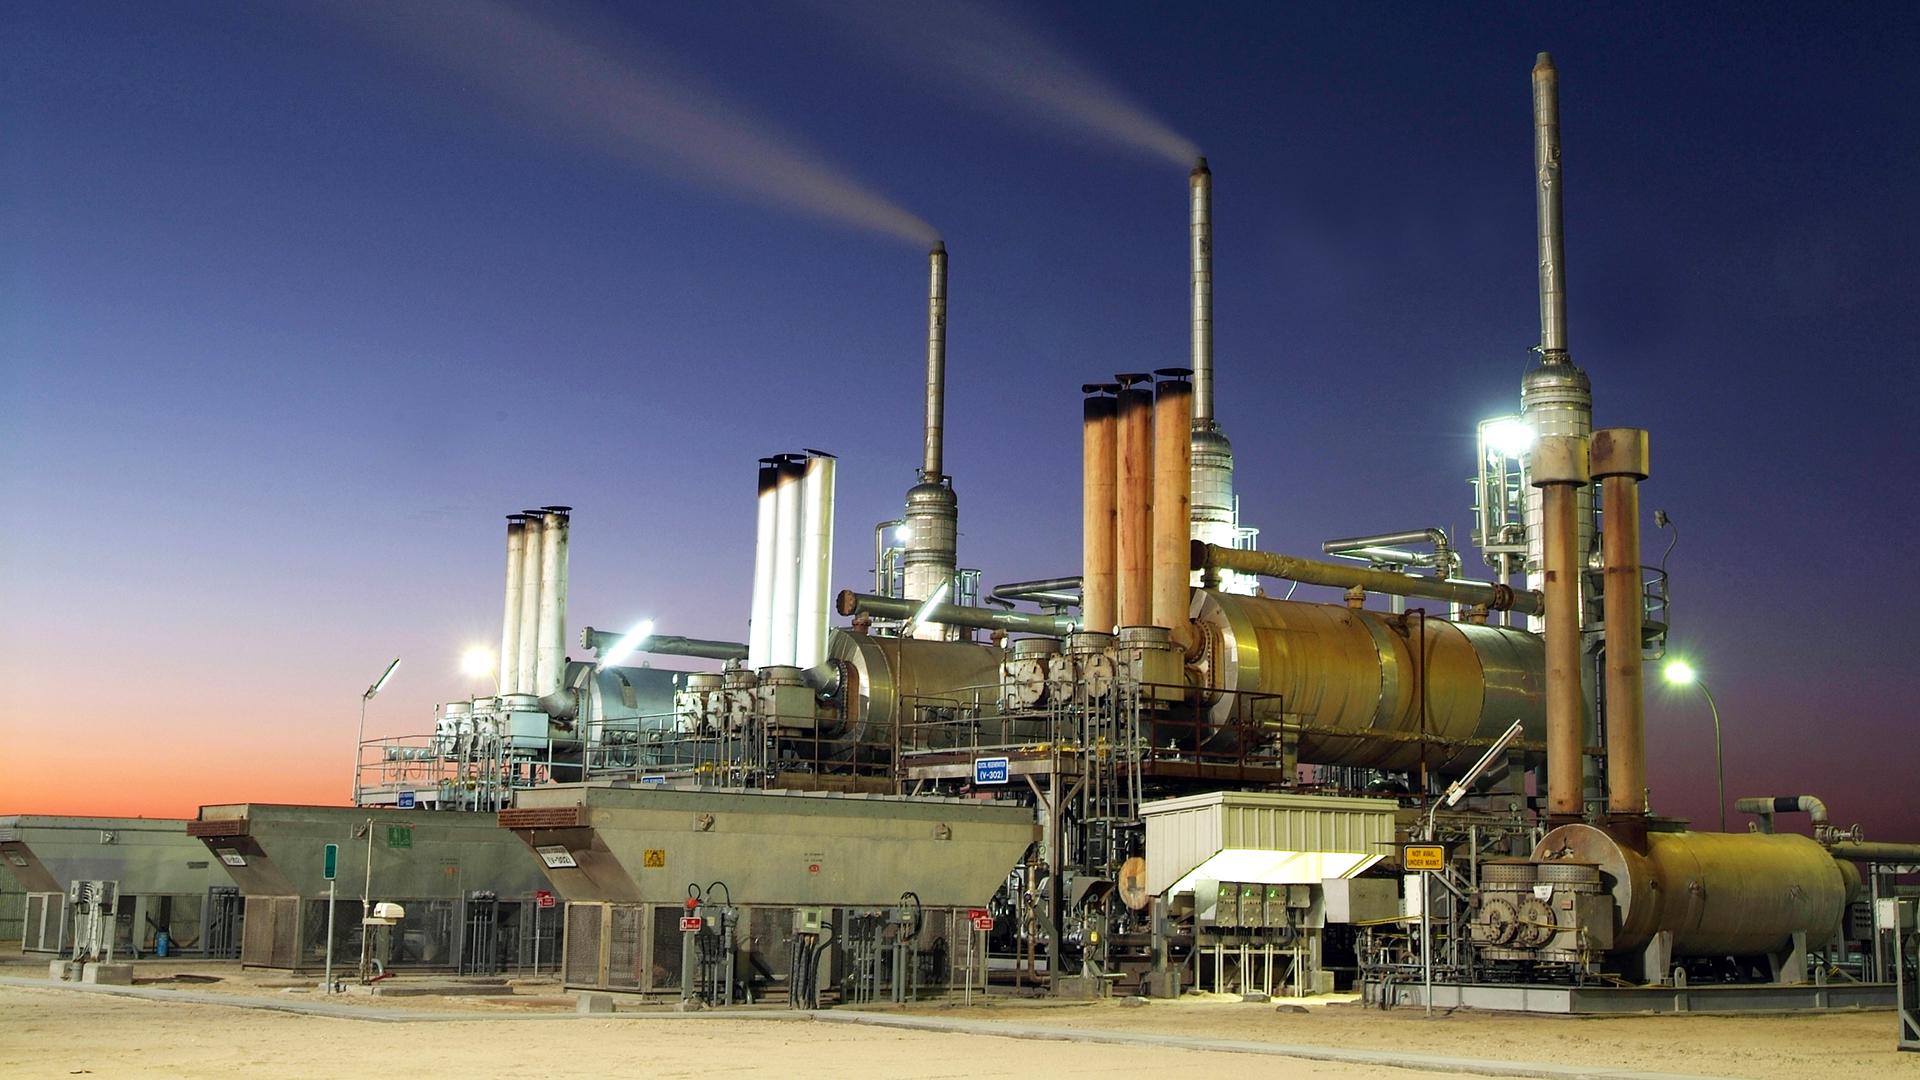 KEEPING AN OIL TRANSPORT SYSTEM FIRE SAFE